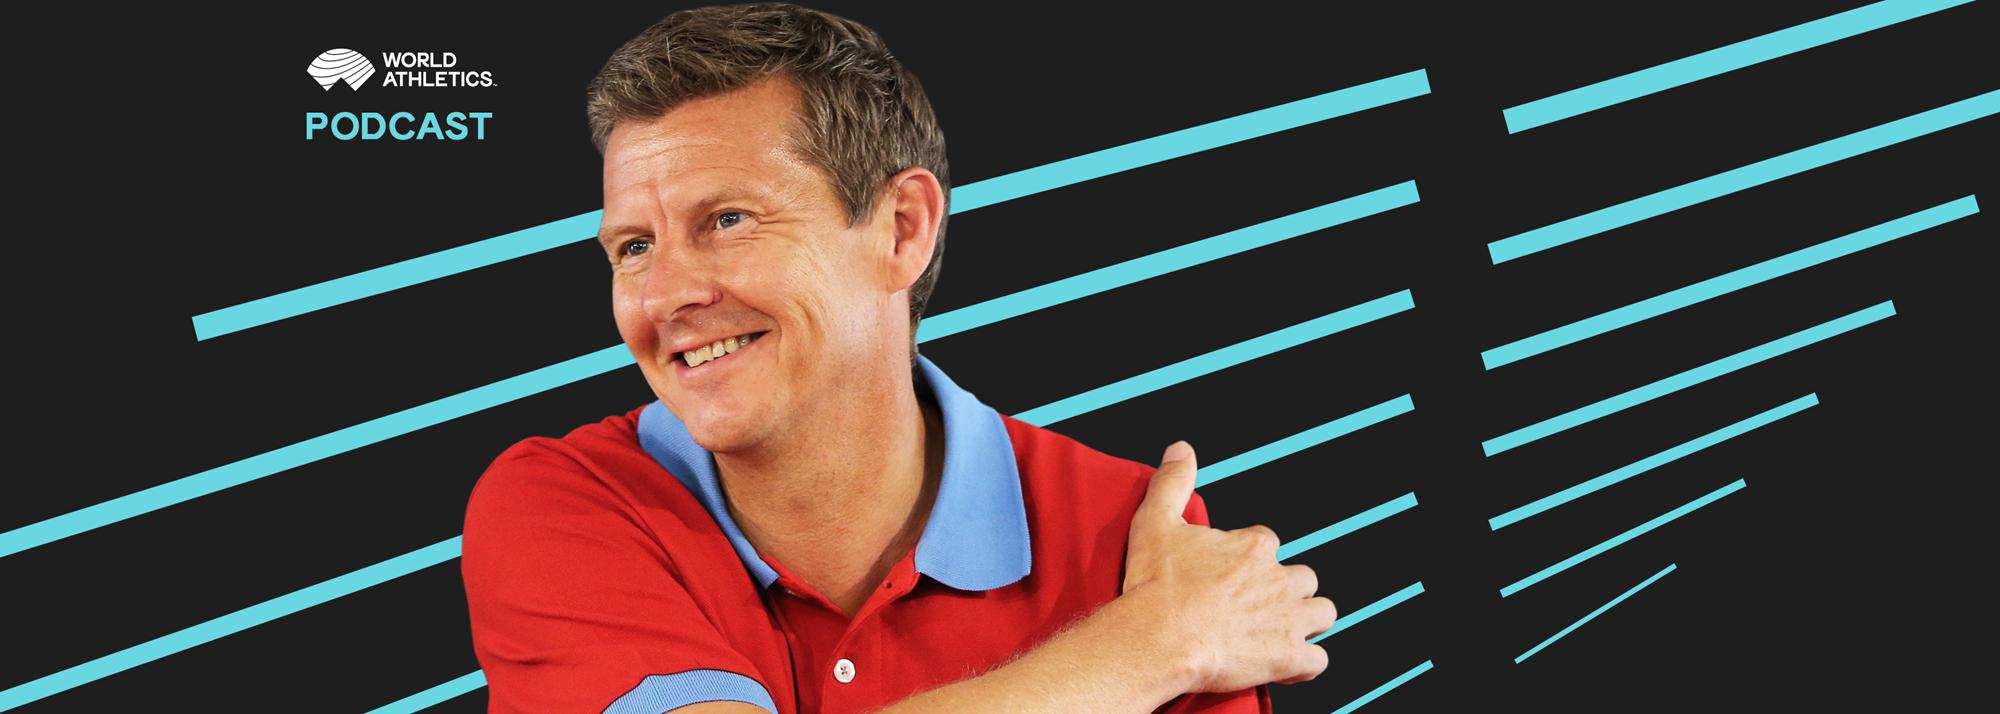 World Athletics podcast – Steve Cram